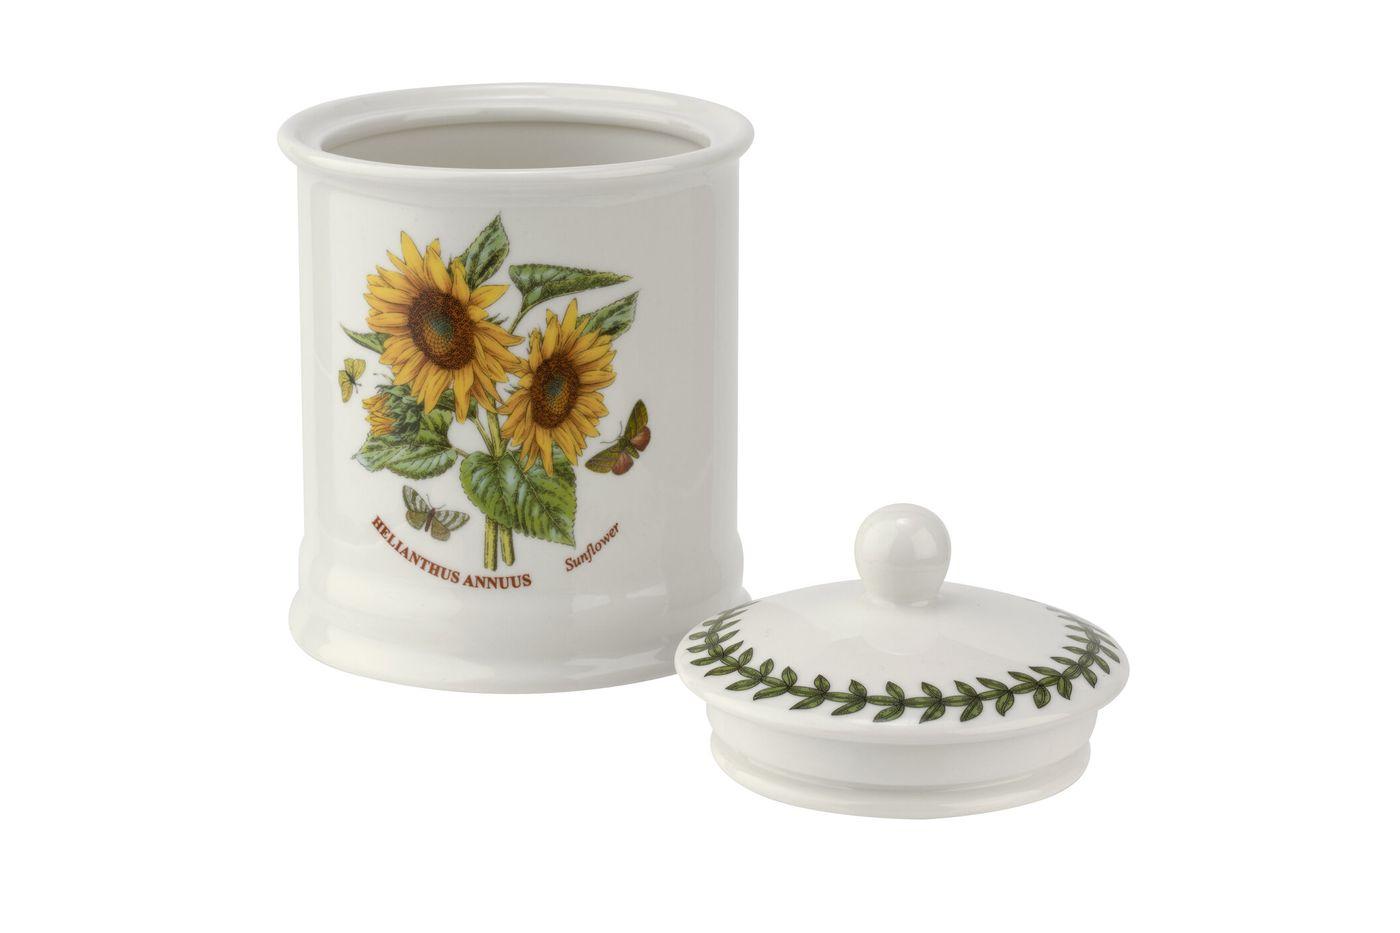 "Portmeirion Botanic Garden Storage Jar + Lid Sunflower 4 x 5 3/4"" thumb 3"